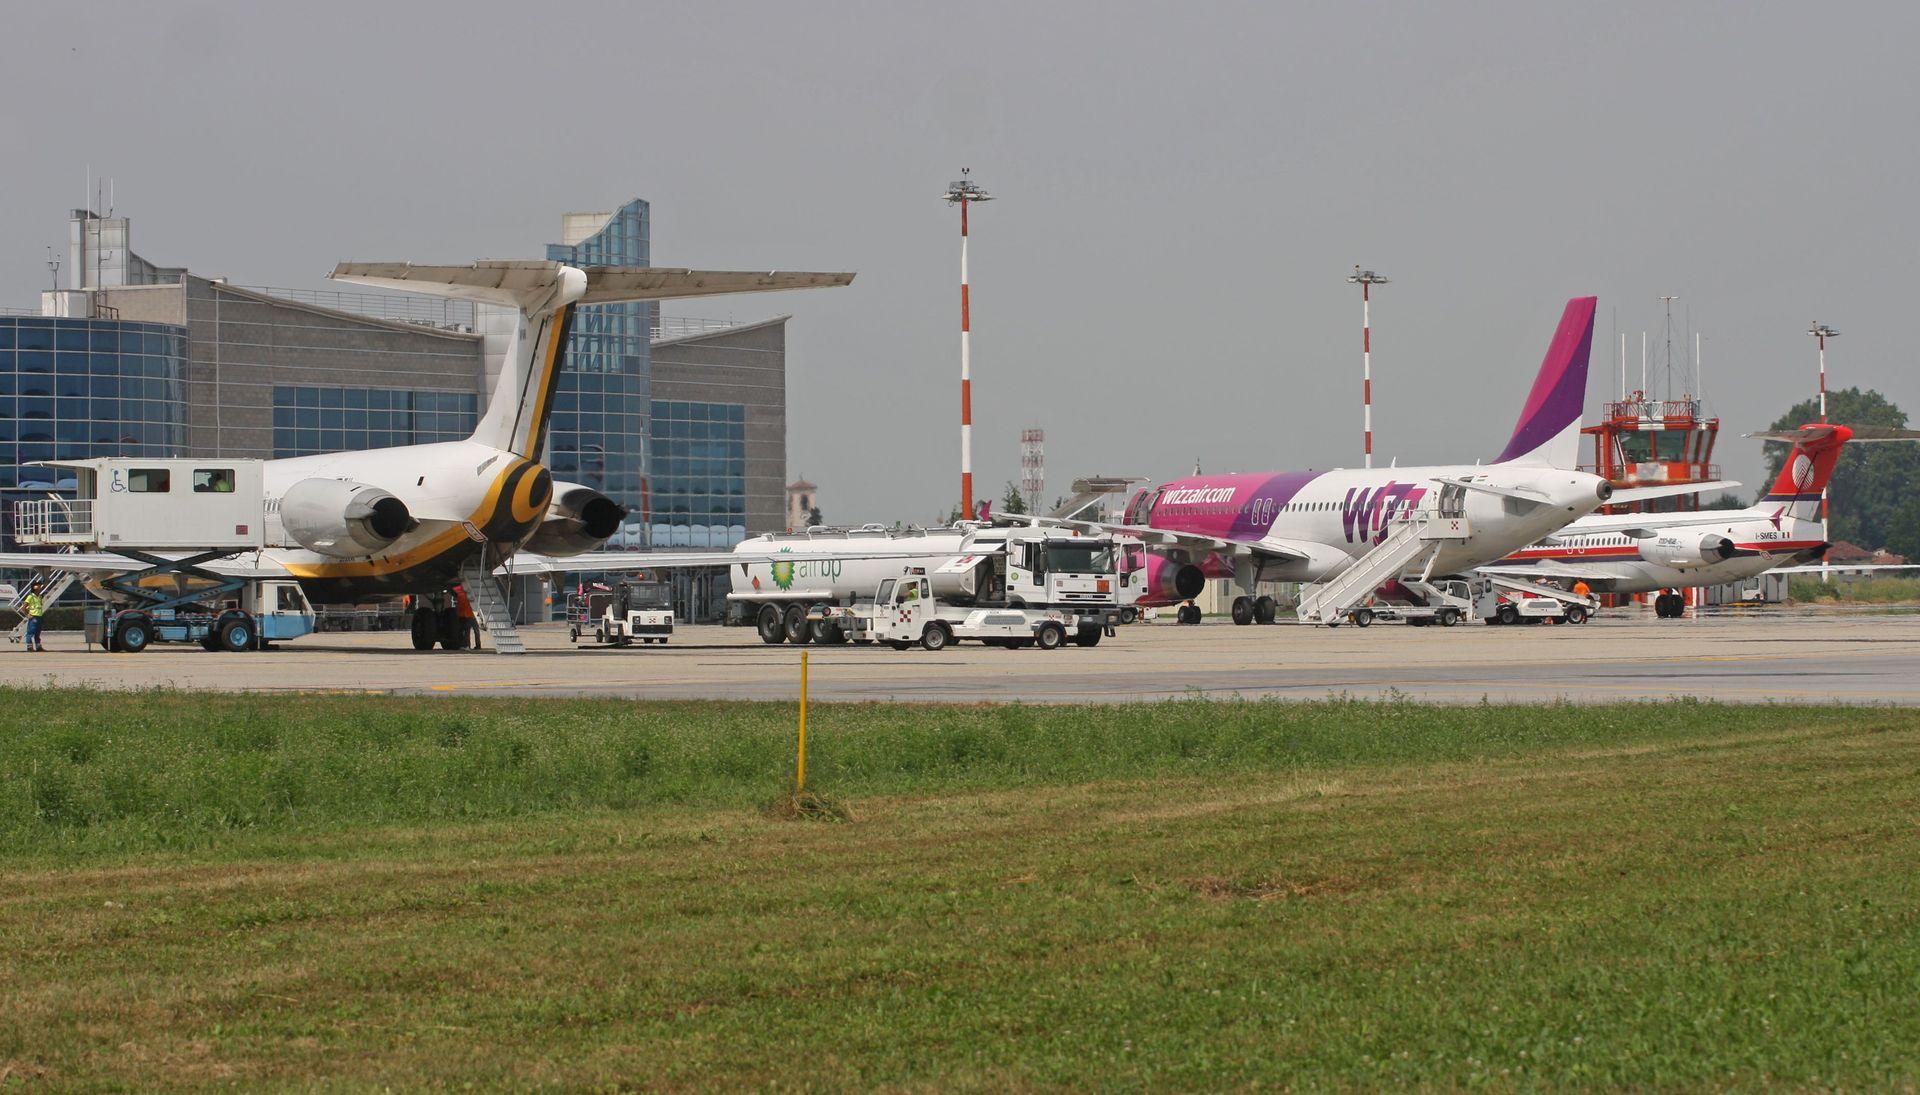 La Guida - Levaldigi, in forte aumento i jet privati